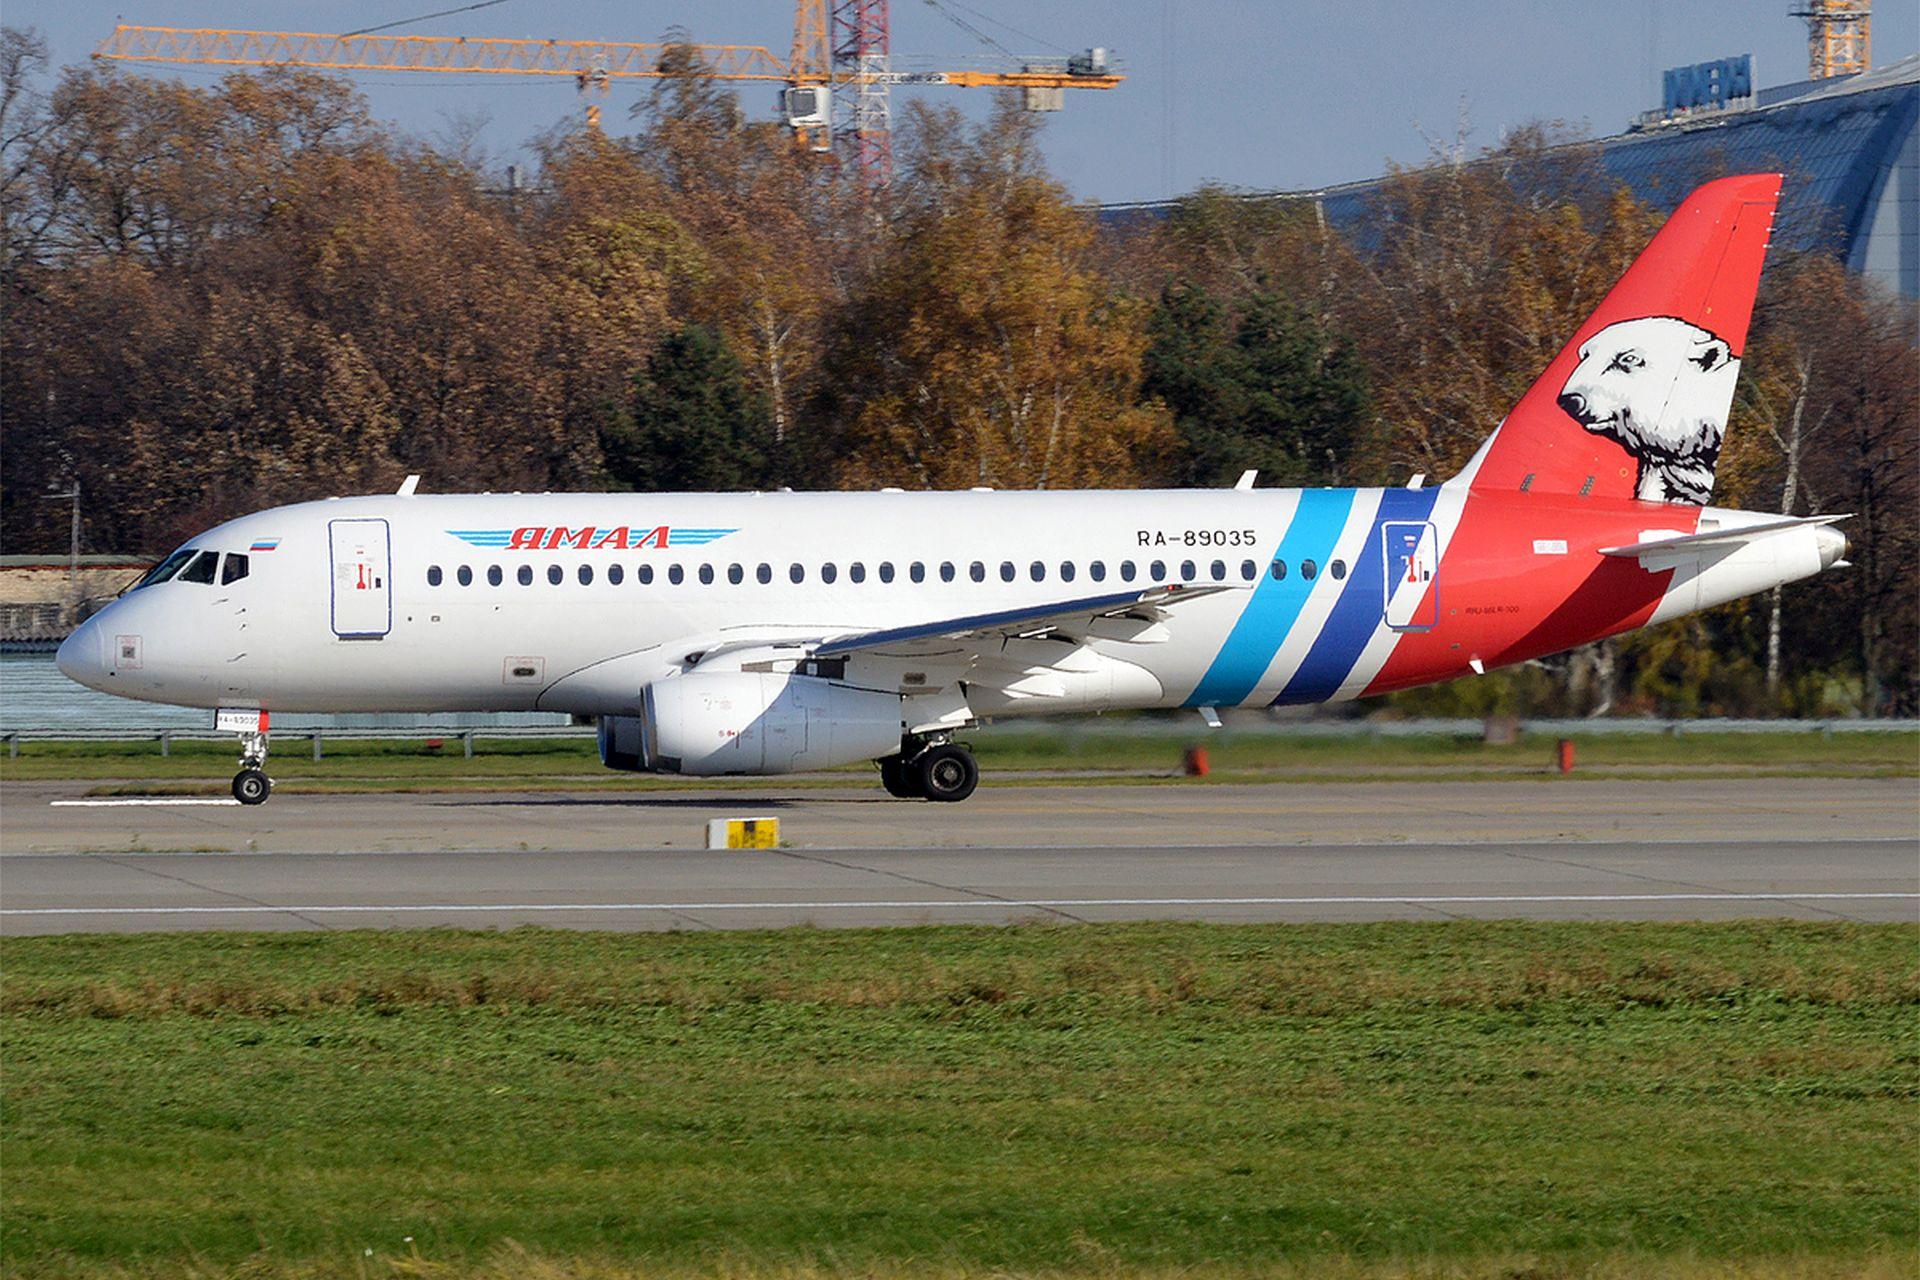 Suchoj SuperJet 100 společnosti Jamal Airlines. Foto: Anna Zvereva from Tallinn, Estonia - Yamal Airlines, RA-89035, Sukhoi Superjet 100-95LR, CC BY-SA 2.0, https://commons.wikimedia.org/w/index.php?curid=53851639